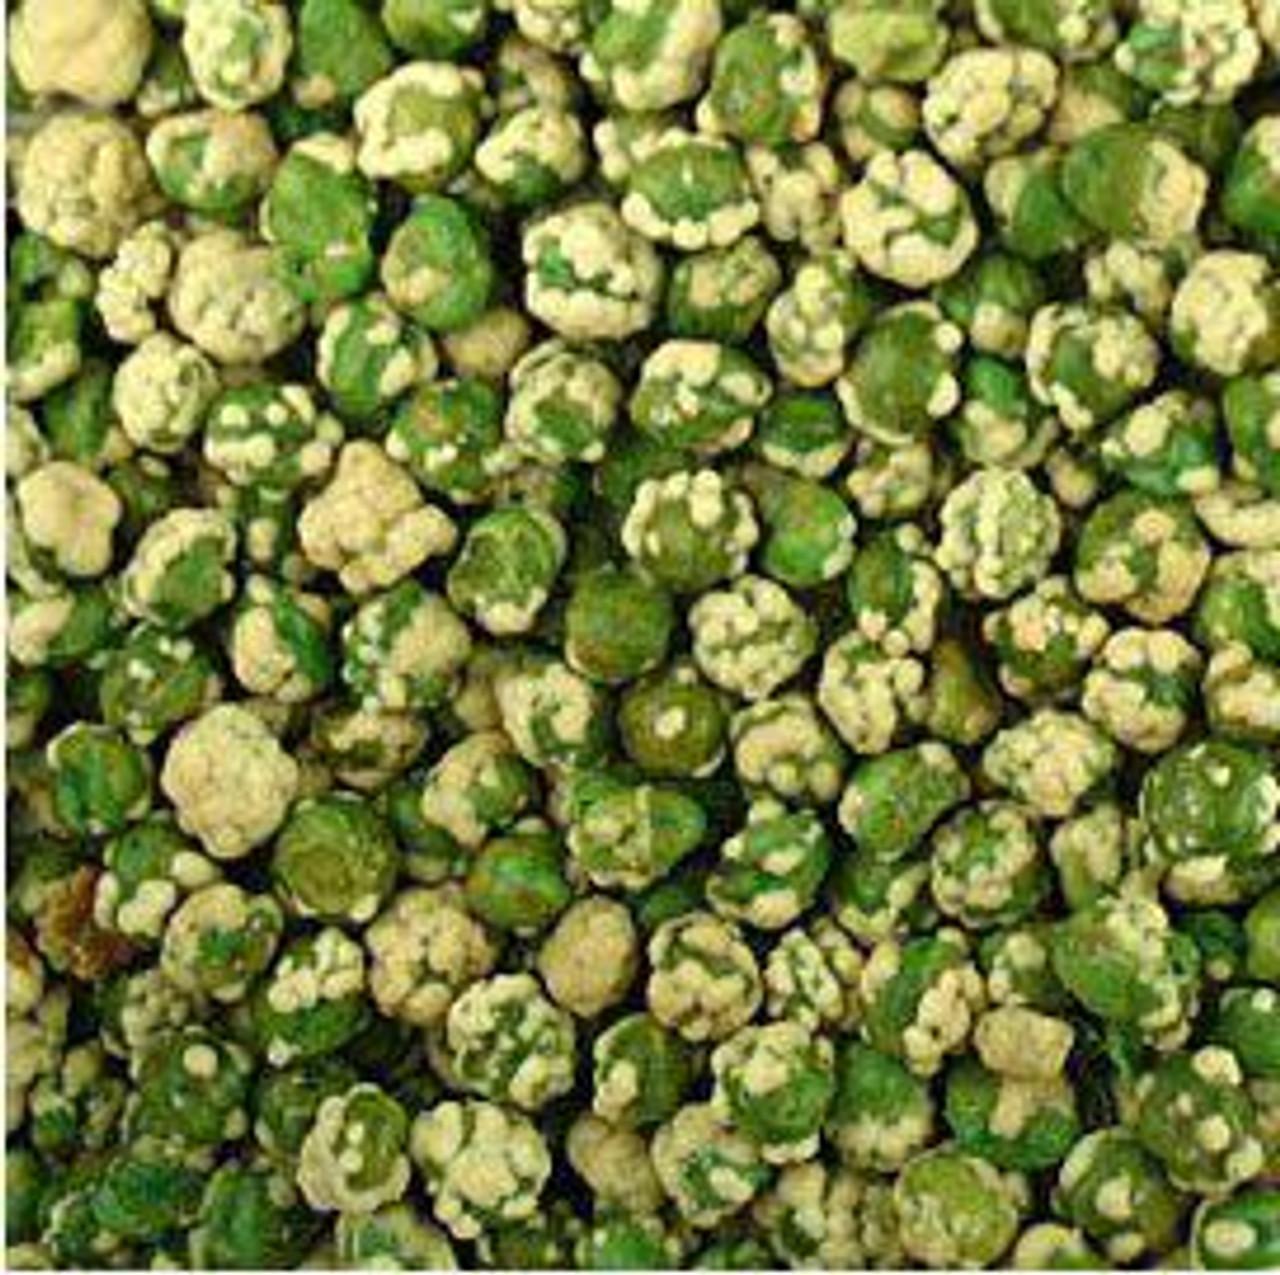 Wasabi Encrusted Peas